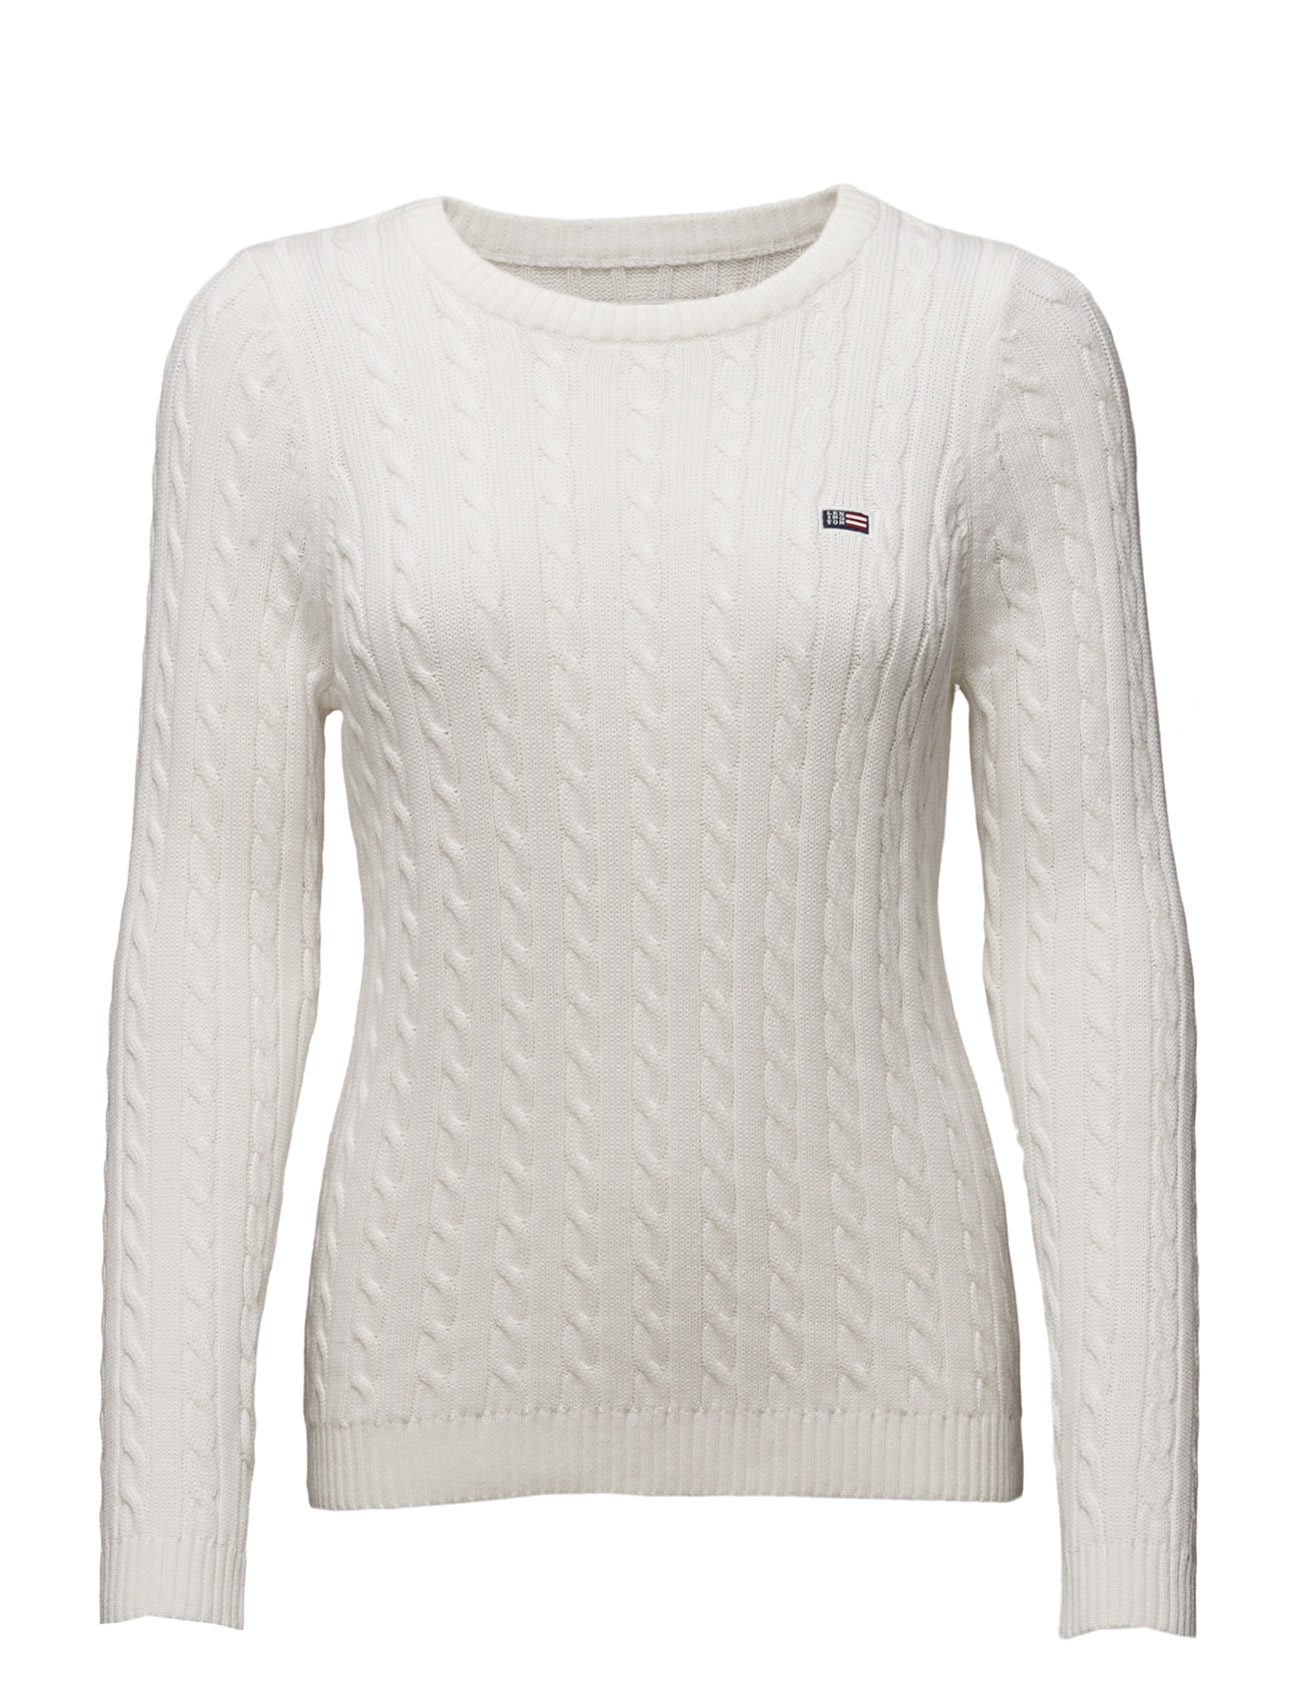 Felizia Sweater Lexington Company Sweatshirts til Damer i Deep Marine Blå